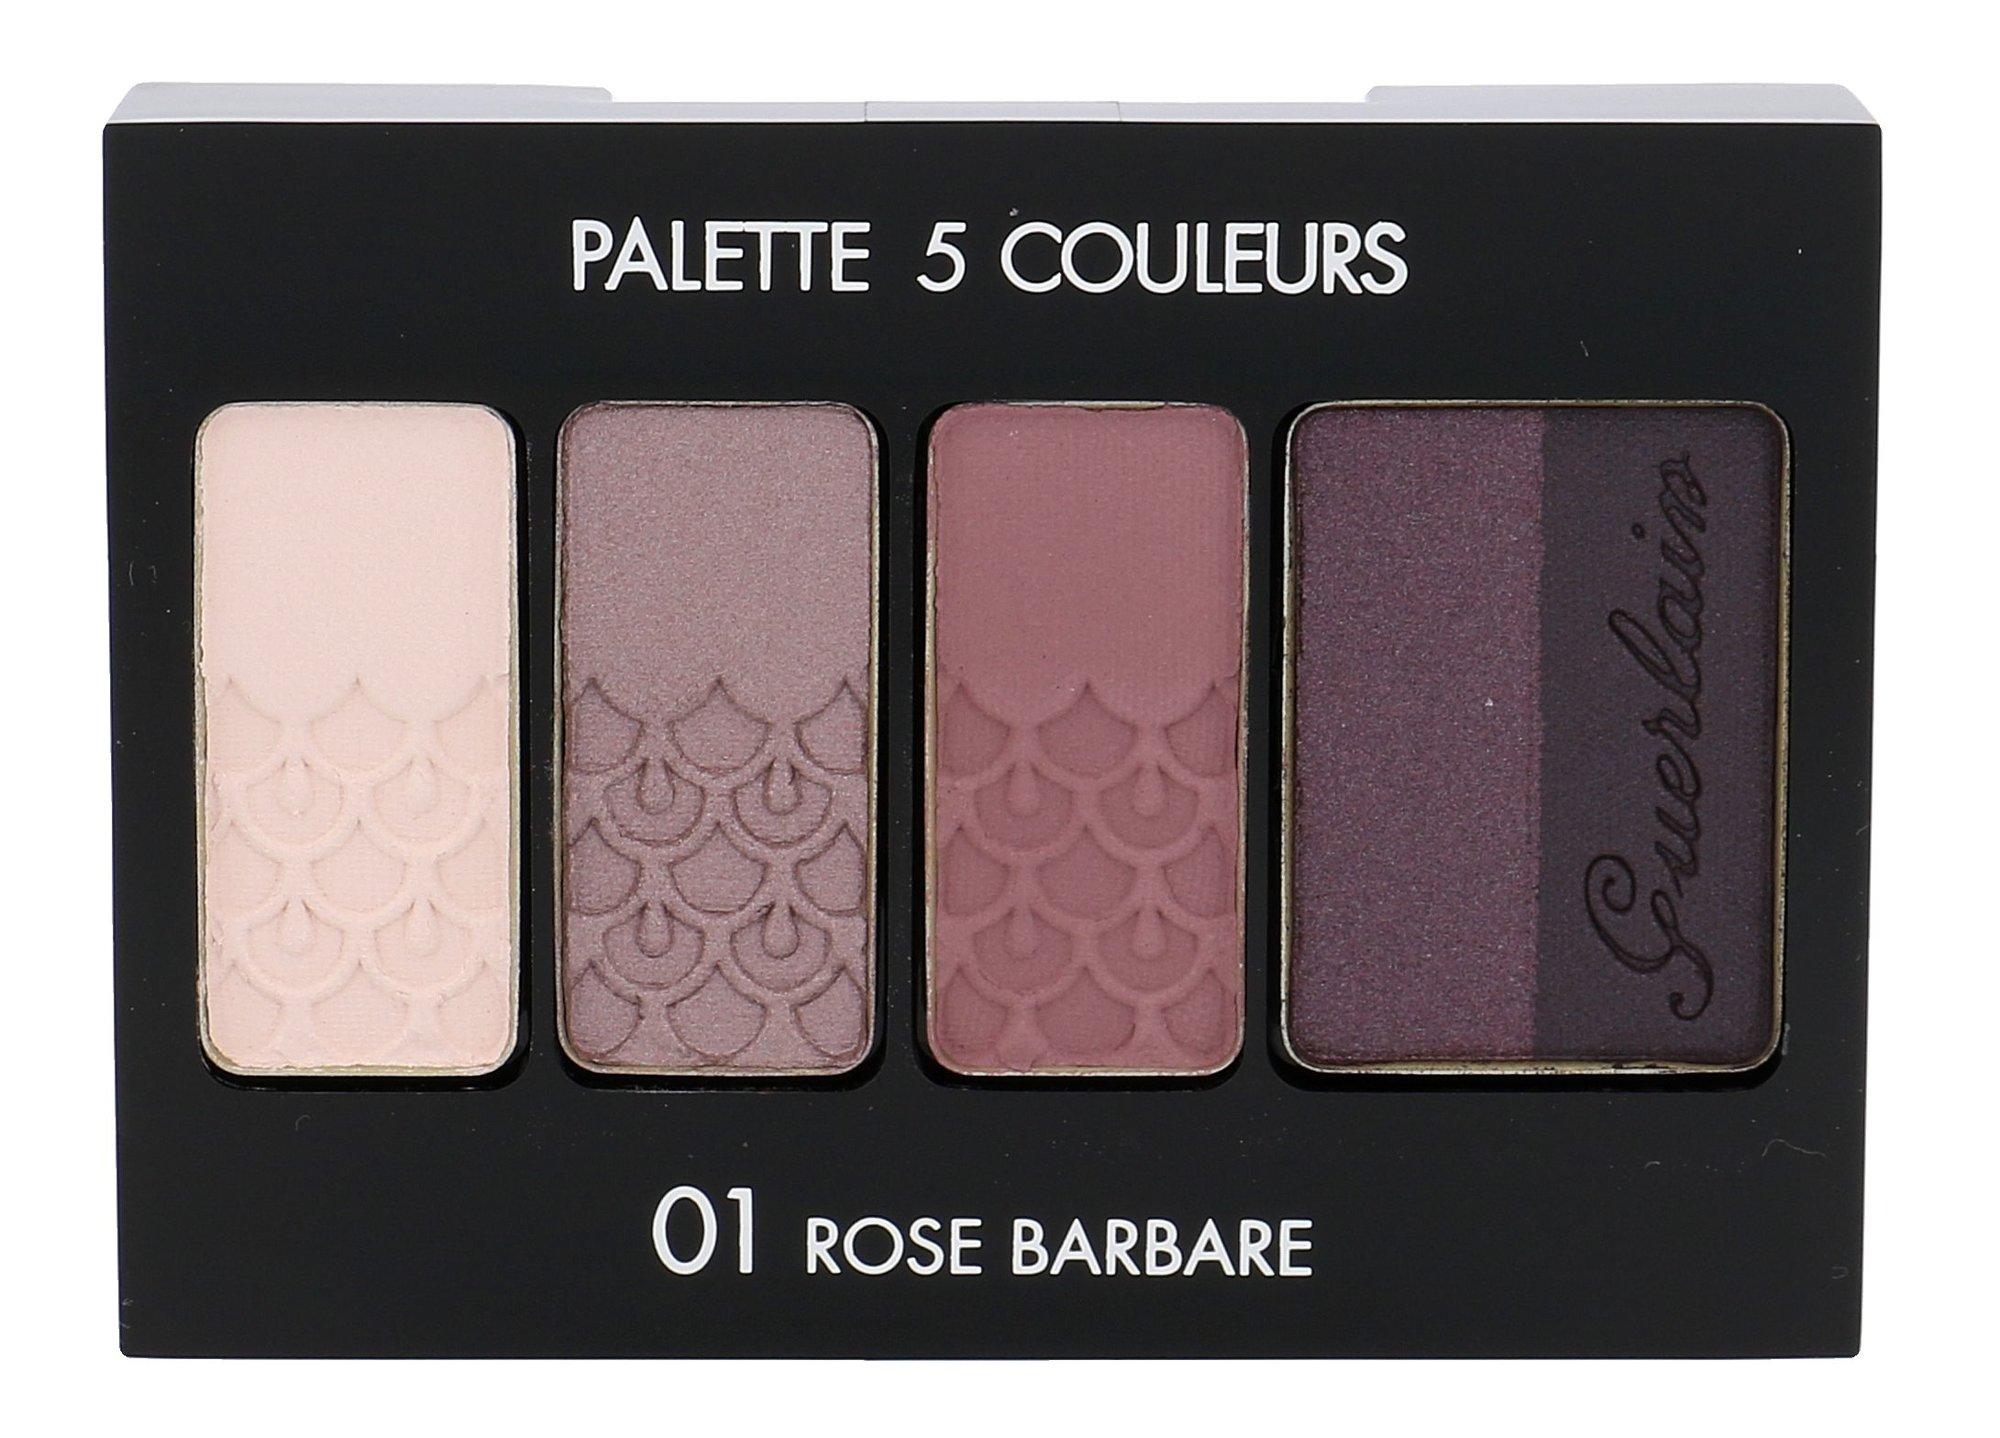 Guerlain Palette 5 Couleurs Cosmetic 6ml 01 Rose Barbare